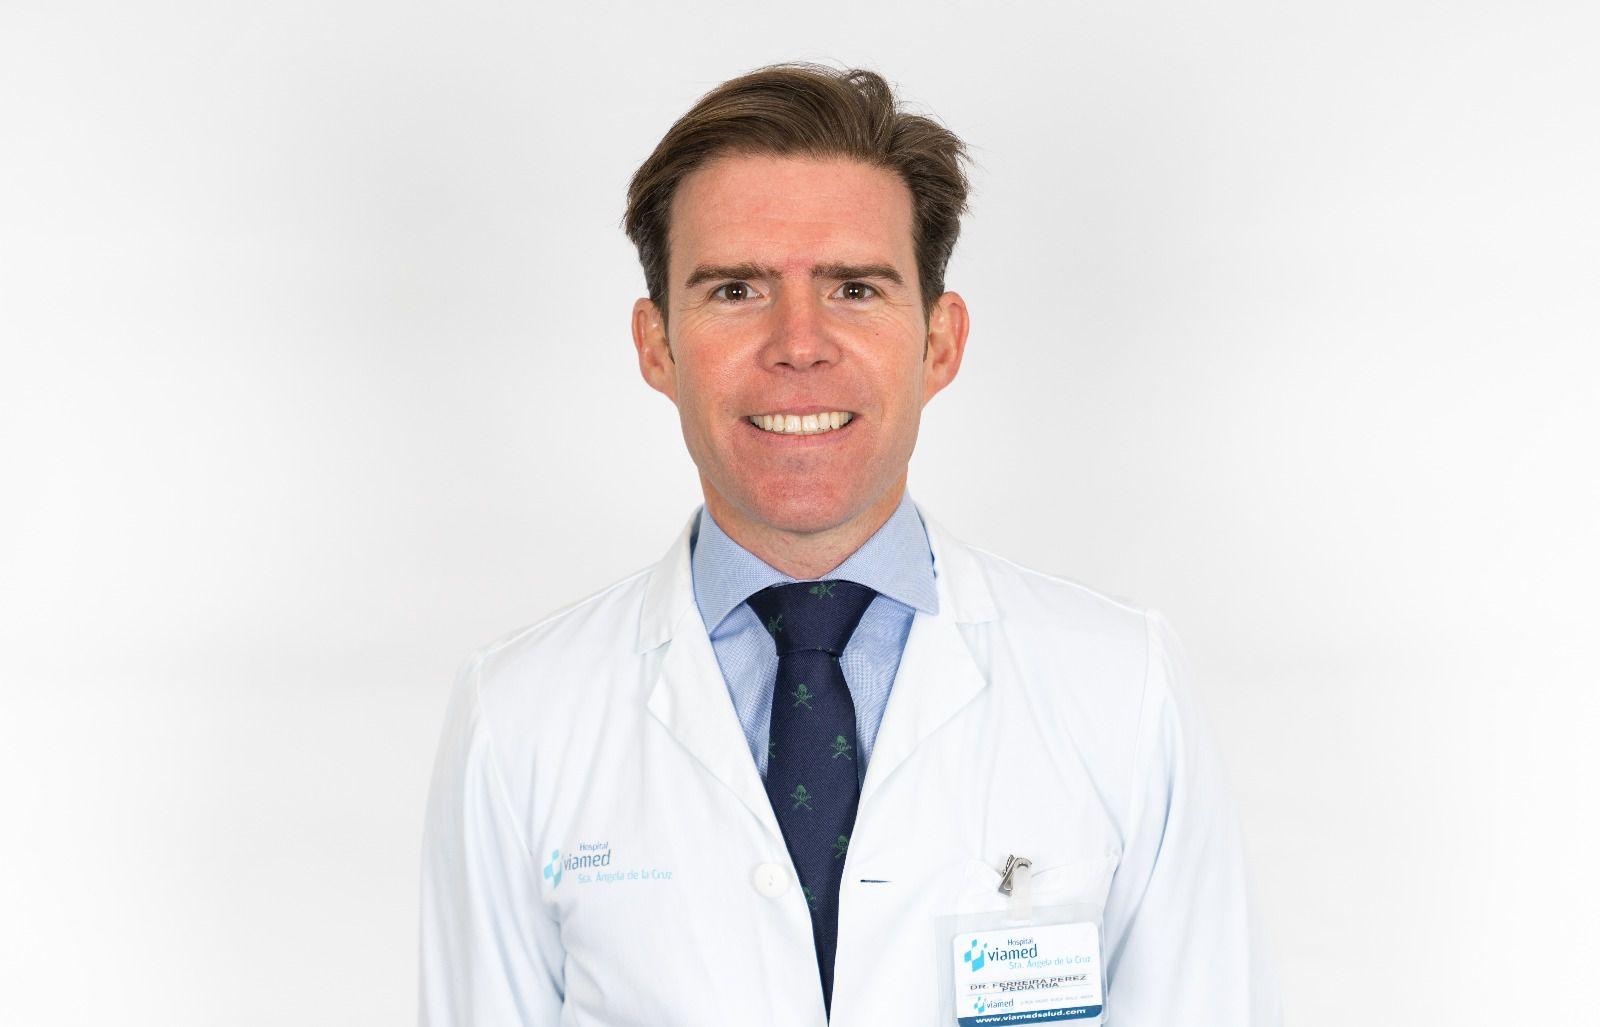 Dr. Ferreira